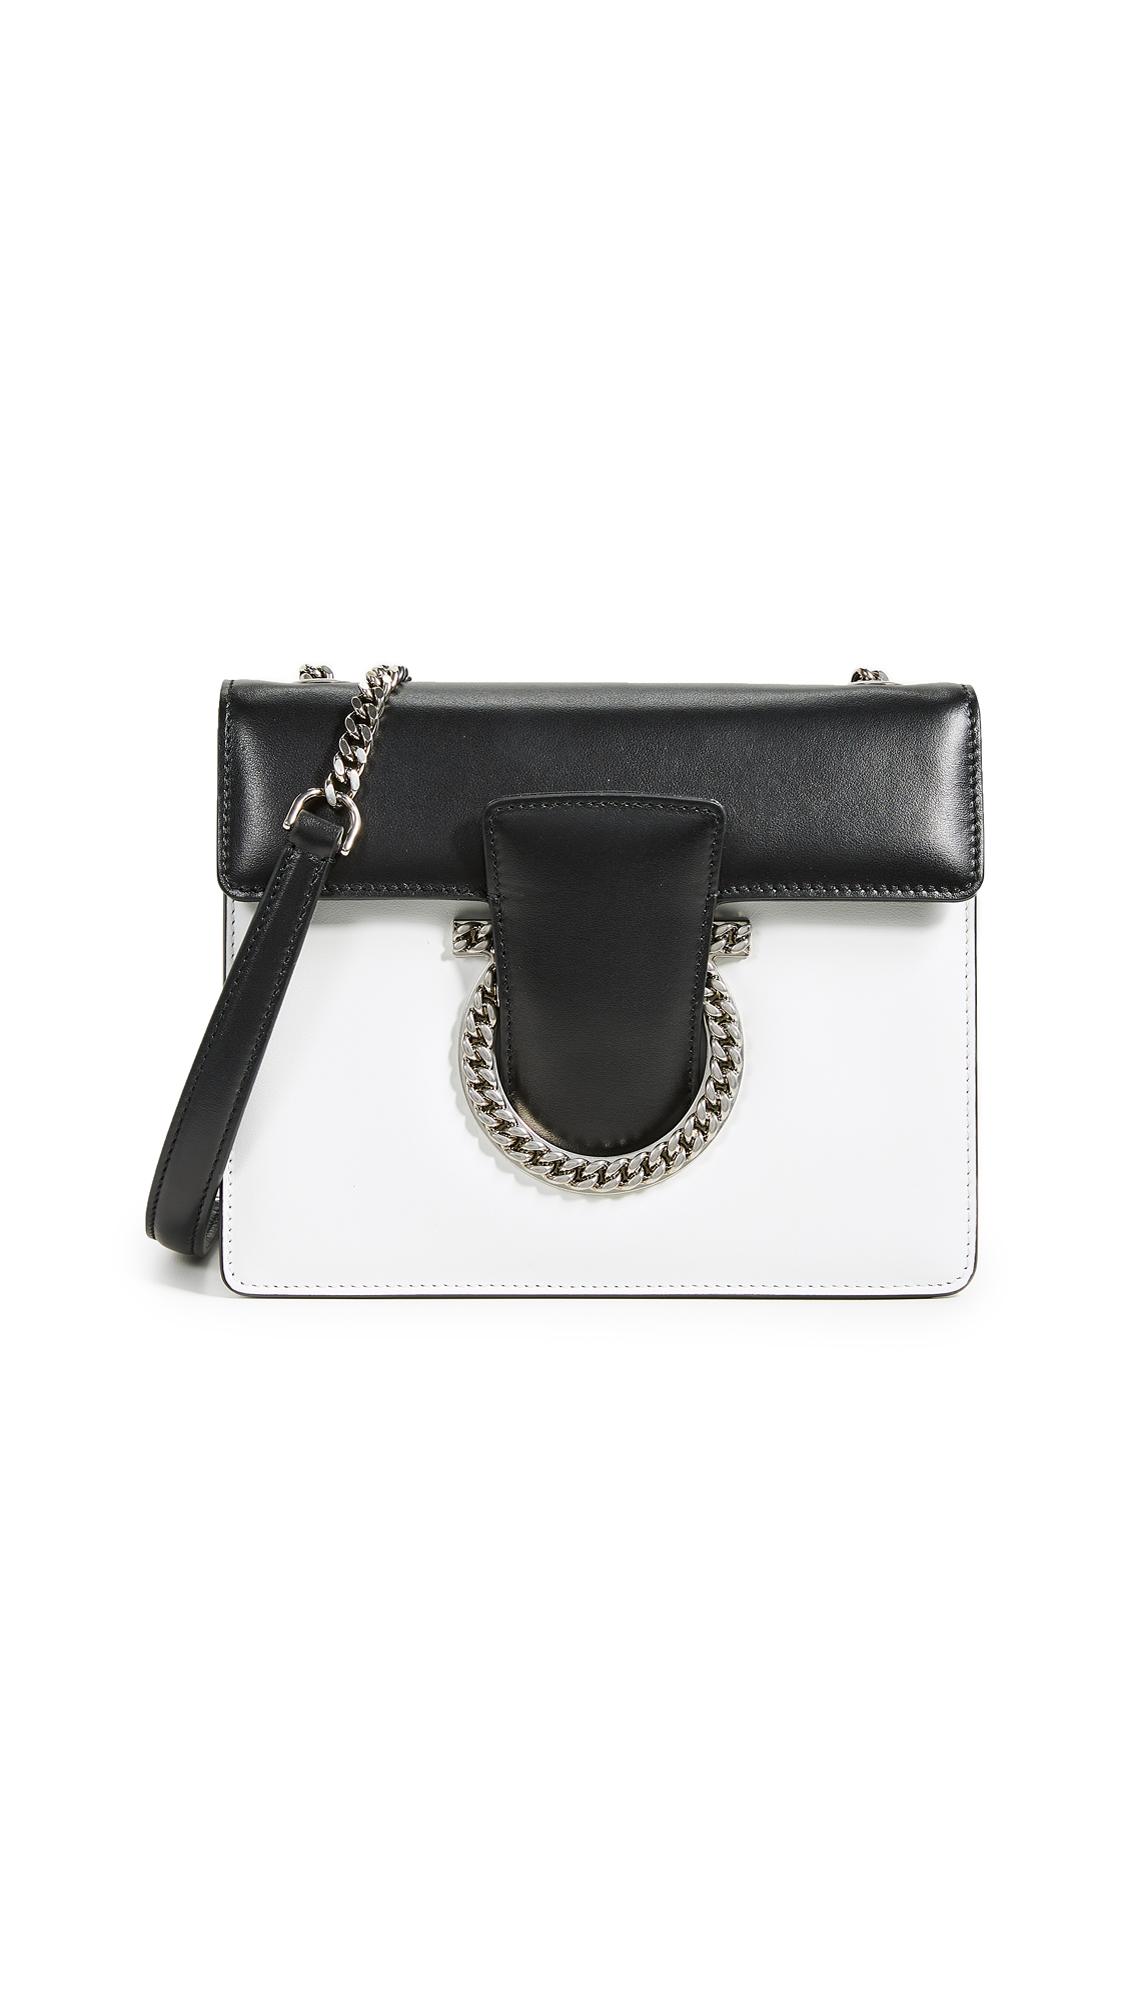 Salvatore Ferragamo Thalia Small Shoulder Bag - New Bianco